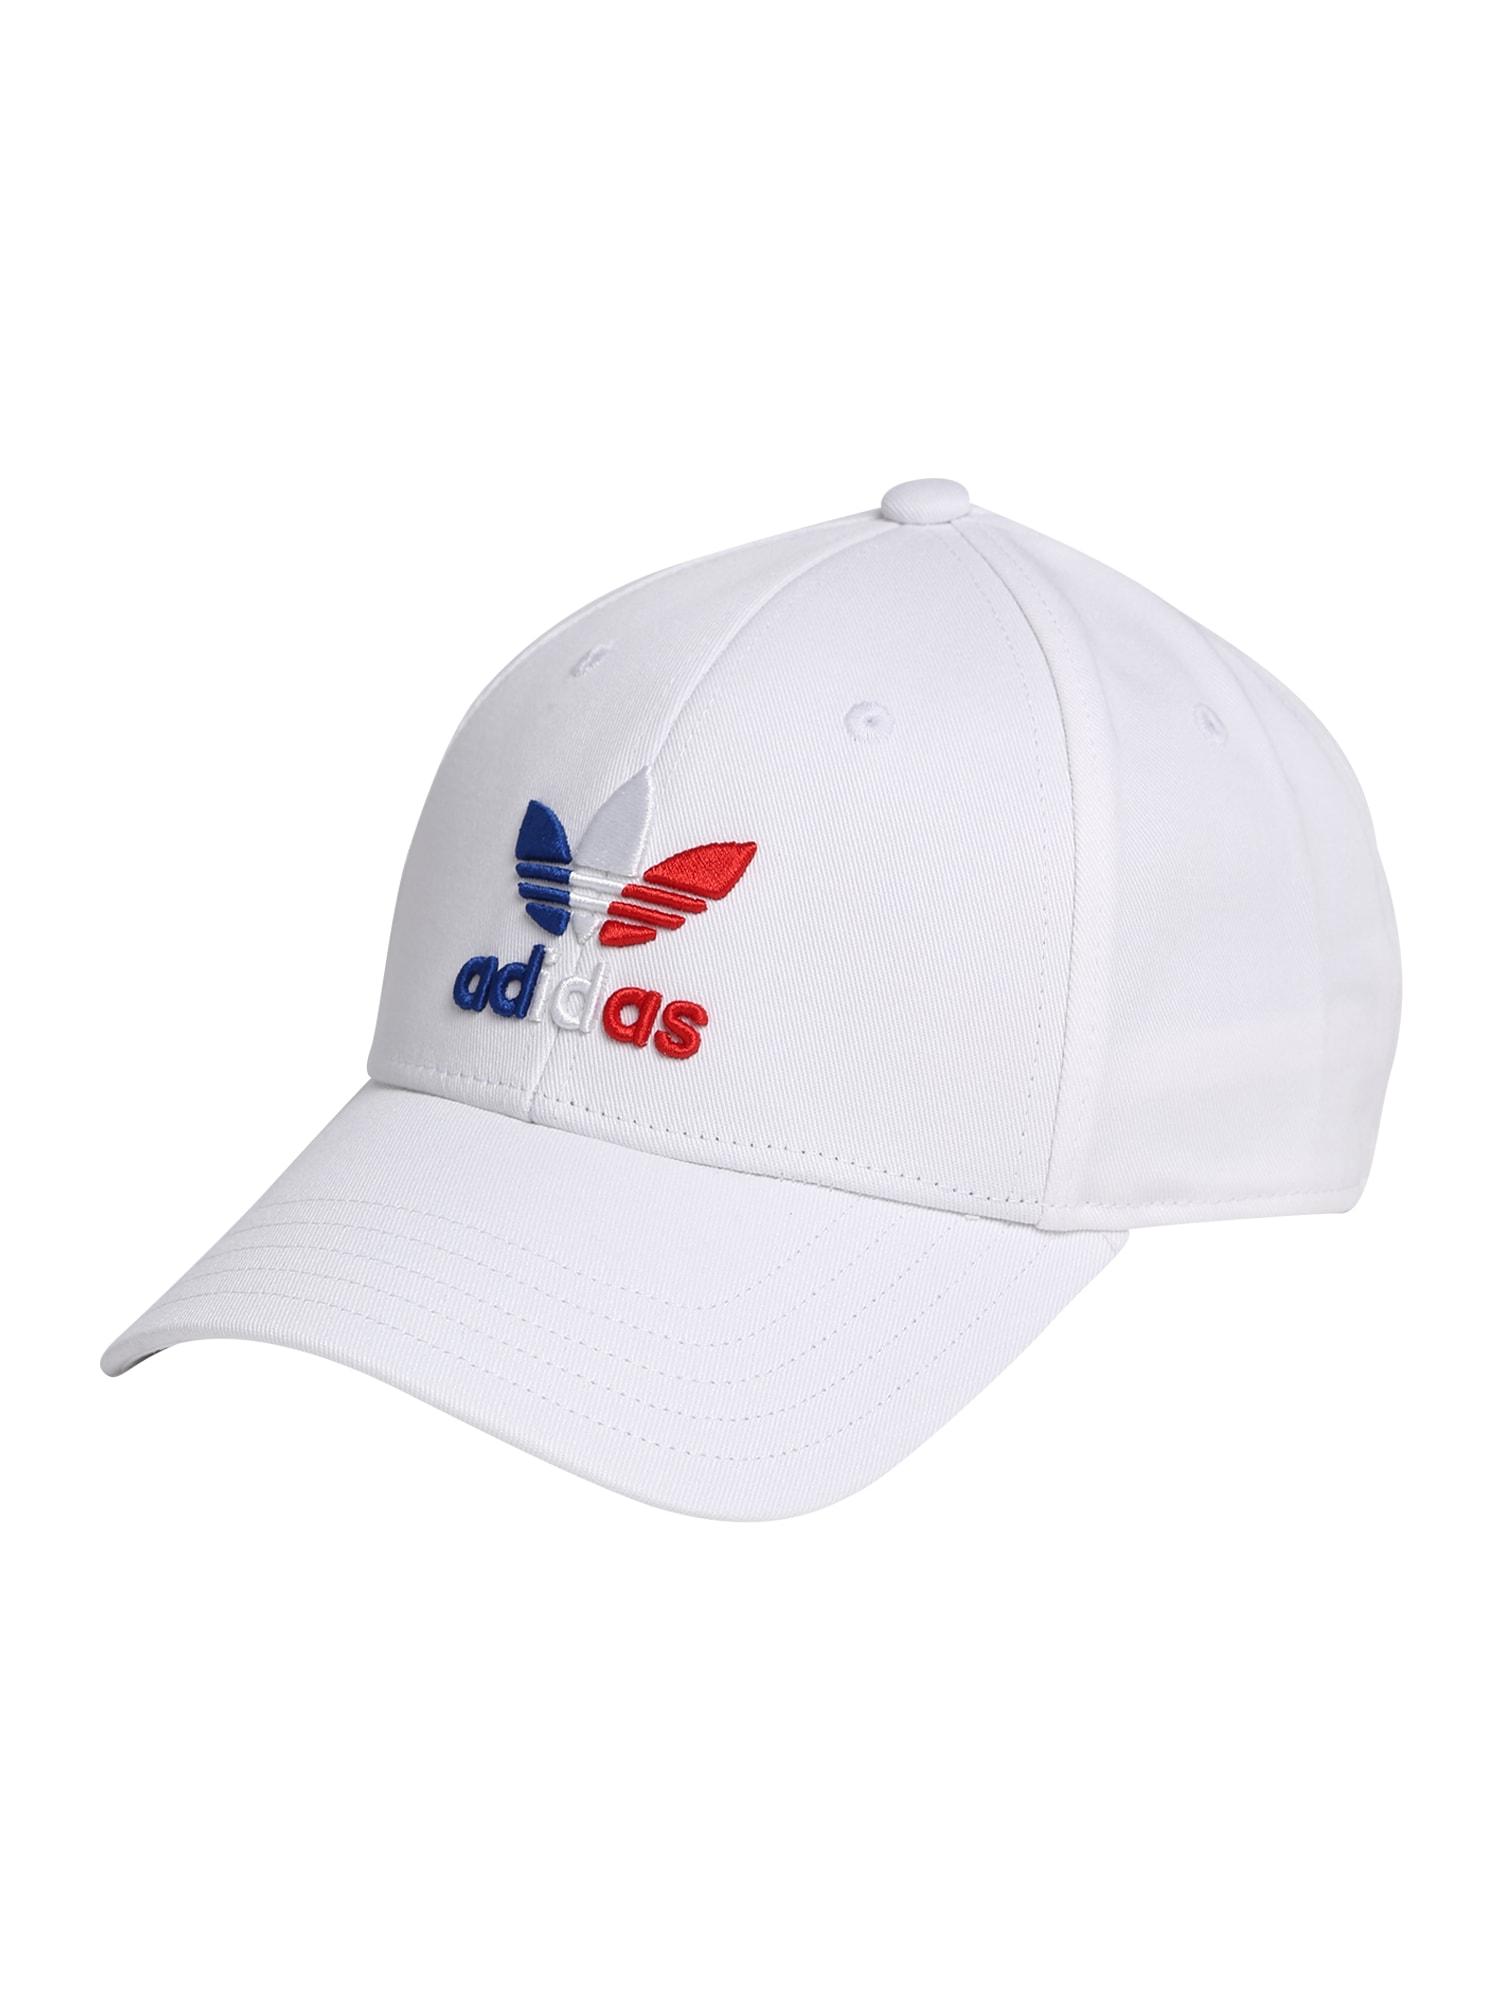 ADIDAS ORIGINALS Kepurė balkšva / raudona / mėlyna